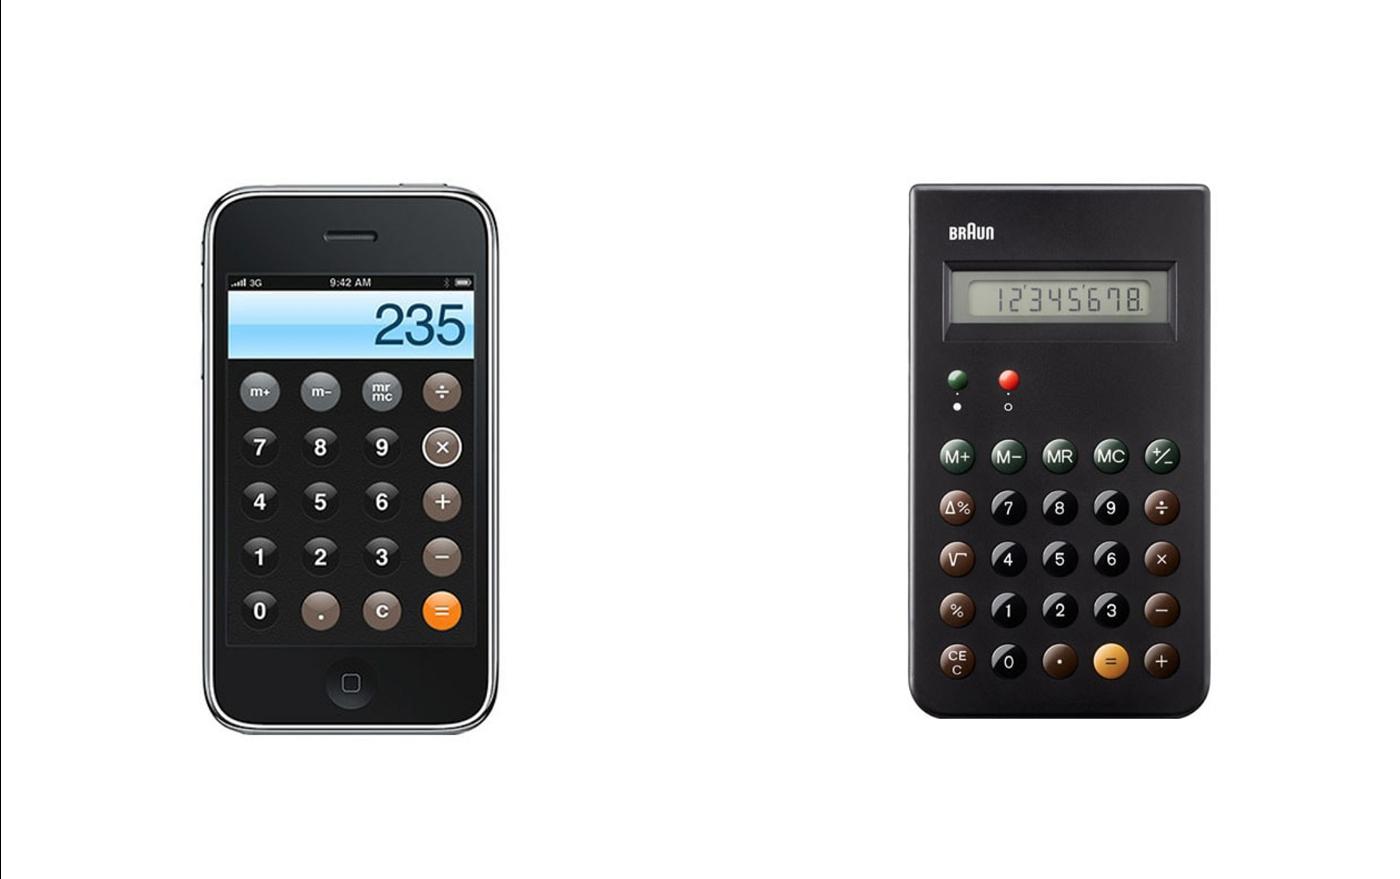 iPhone Calculator (2007) and Braun ET66 (1987)